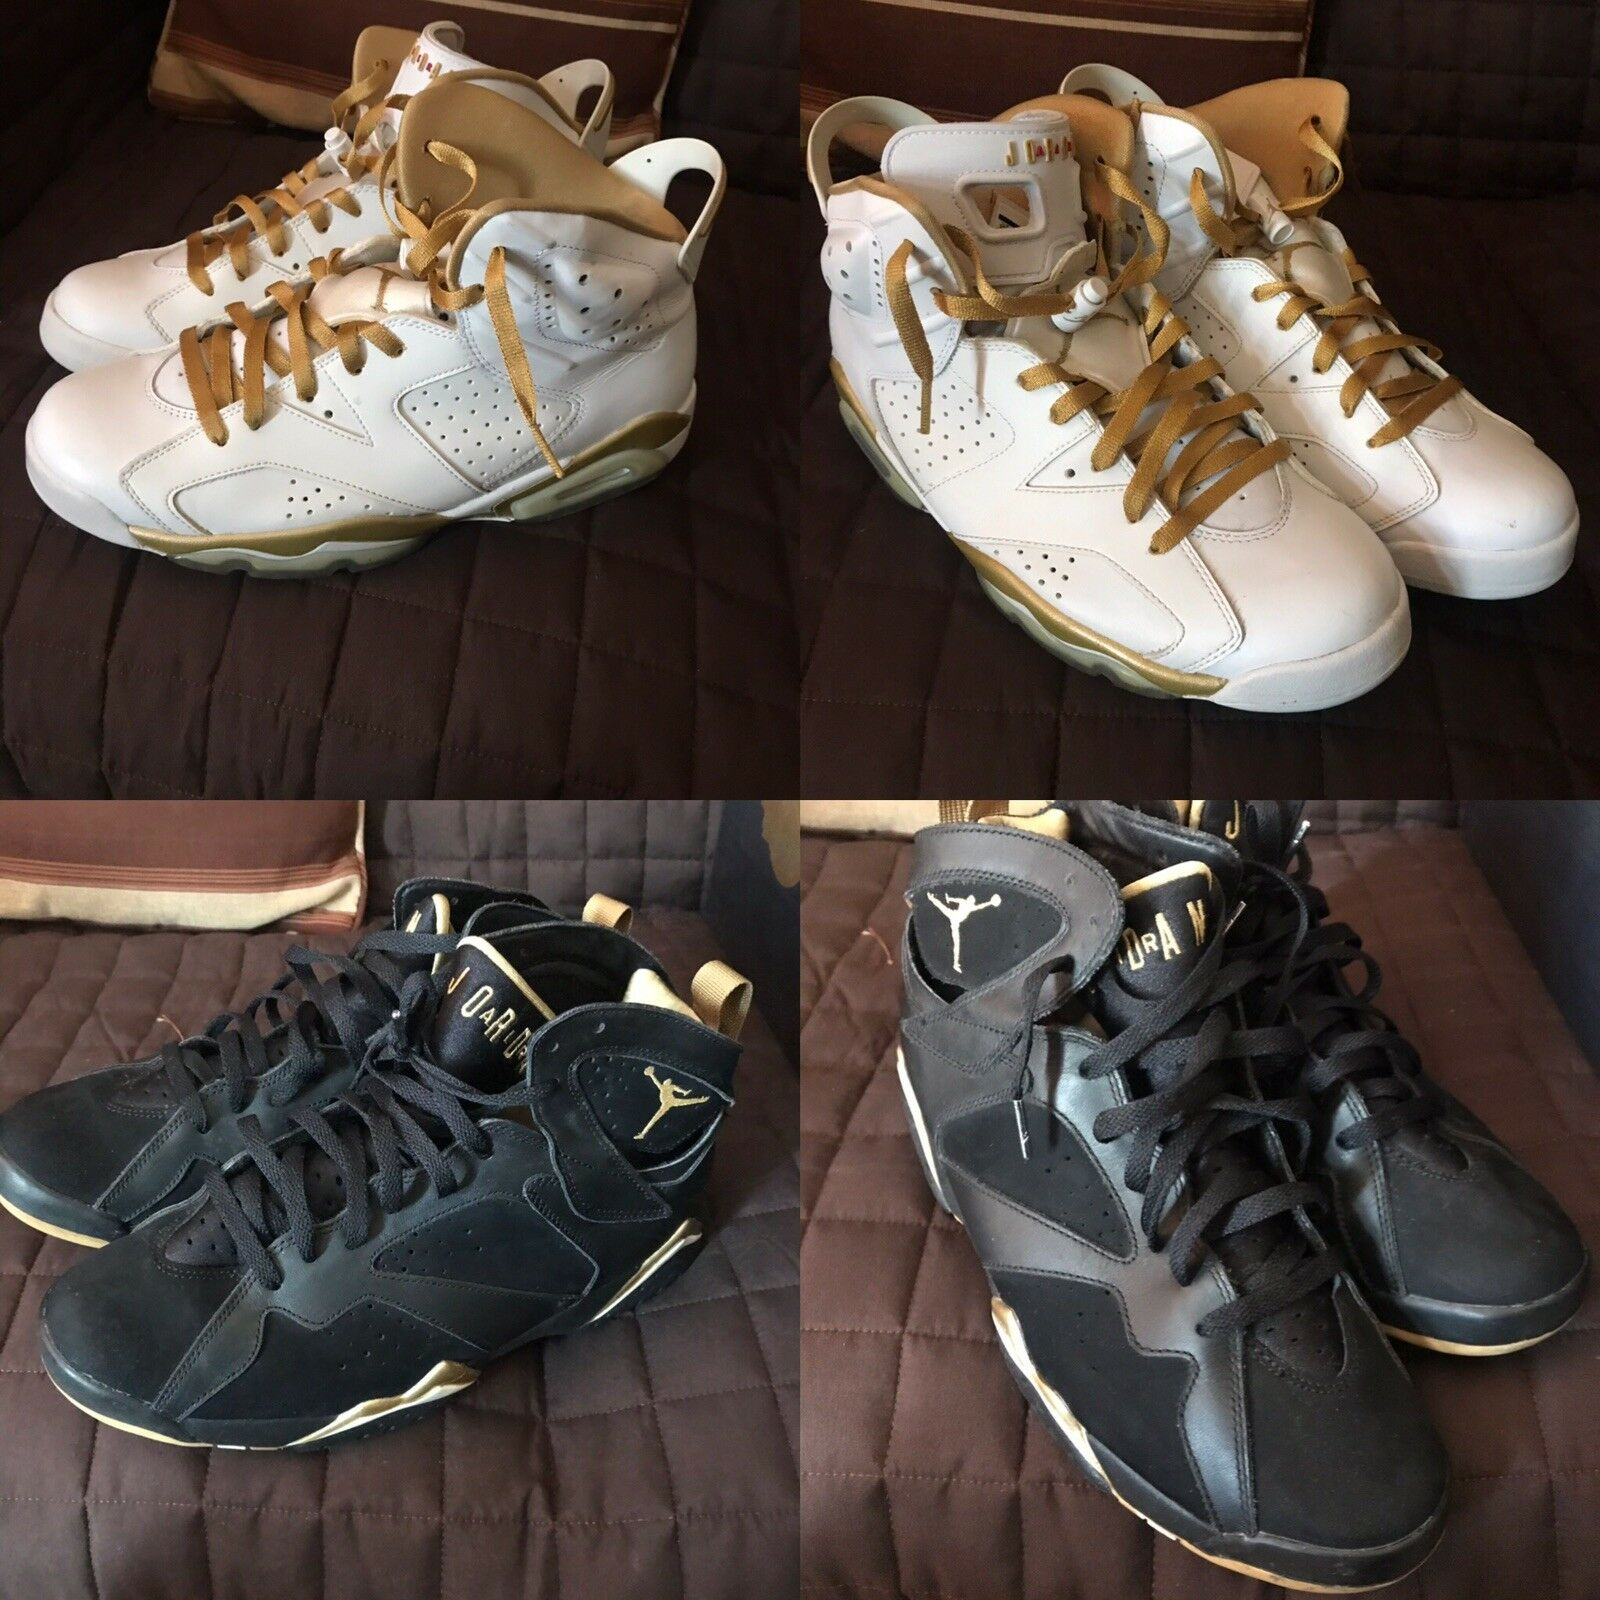 online store b6fa4 78455 NIB Jordan Golden Moments Pack (6 7) - Größe 10.5 10.5 10.5 425828